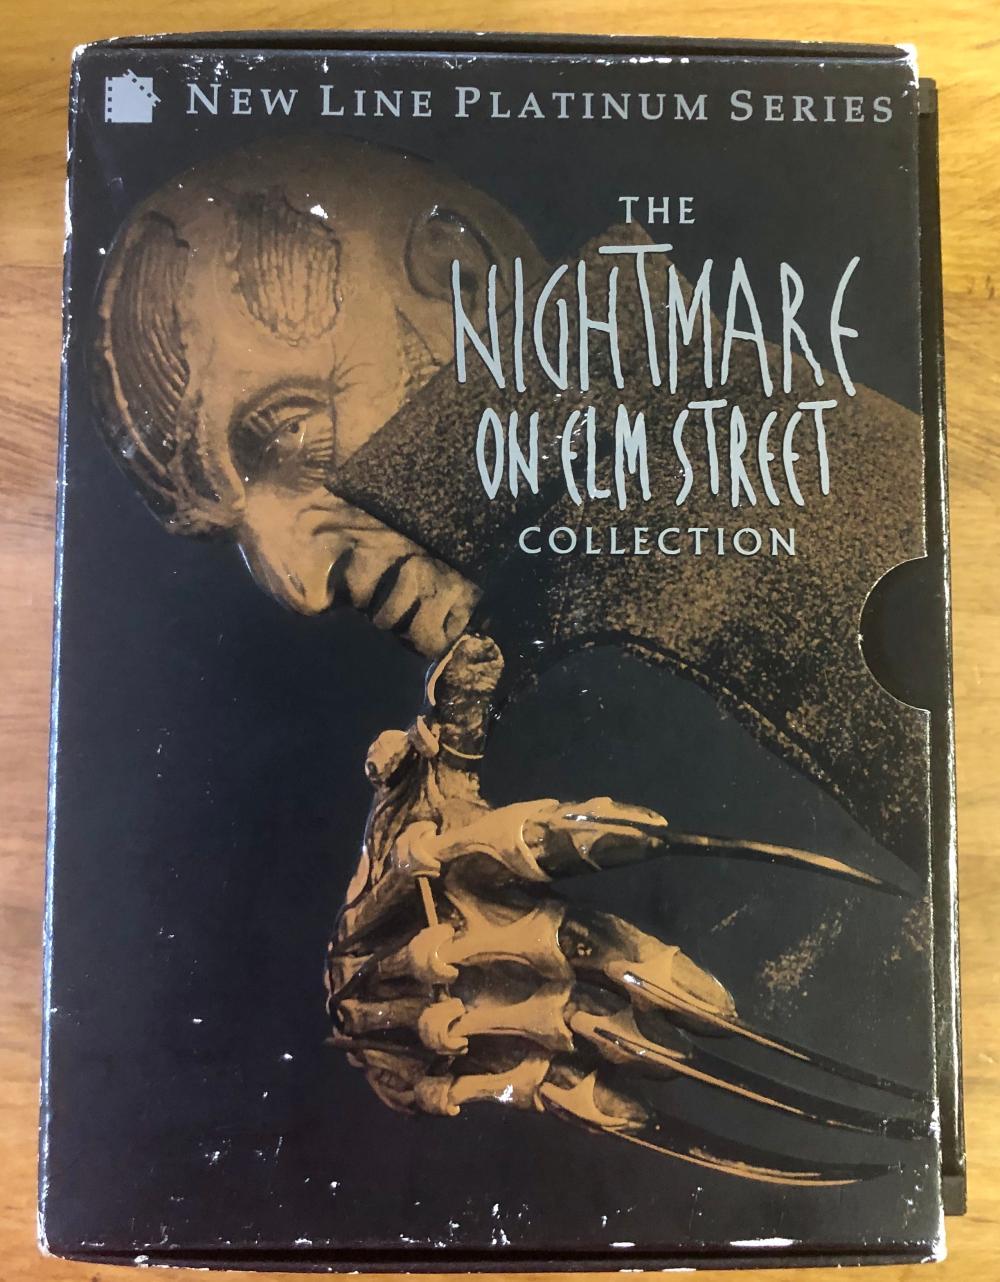 1999 NIGHTMARE ON ELM STREET PLATINUM SERIES (8) DVD COLLECTION SET